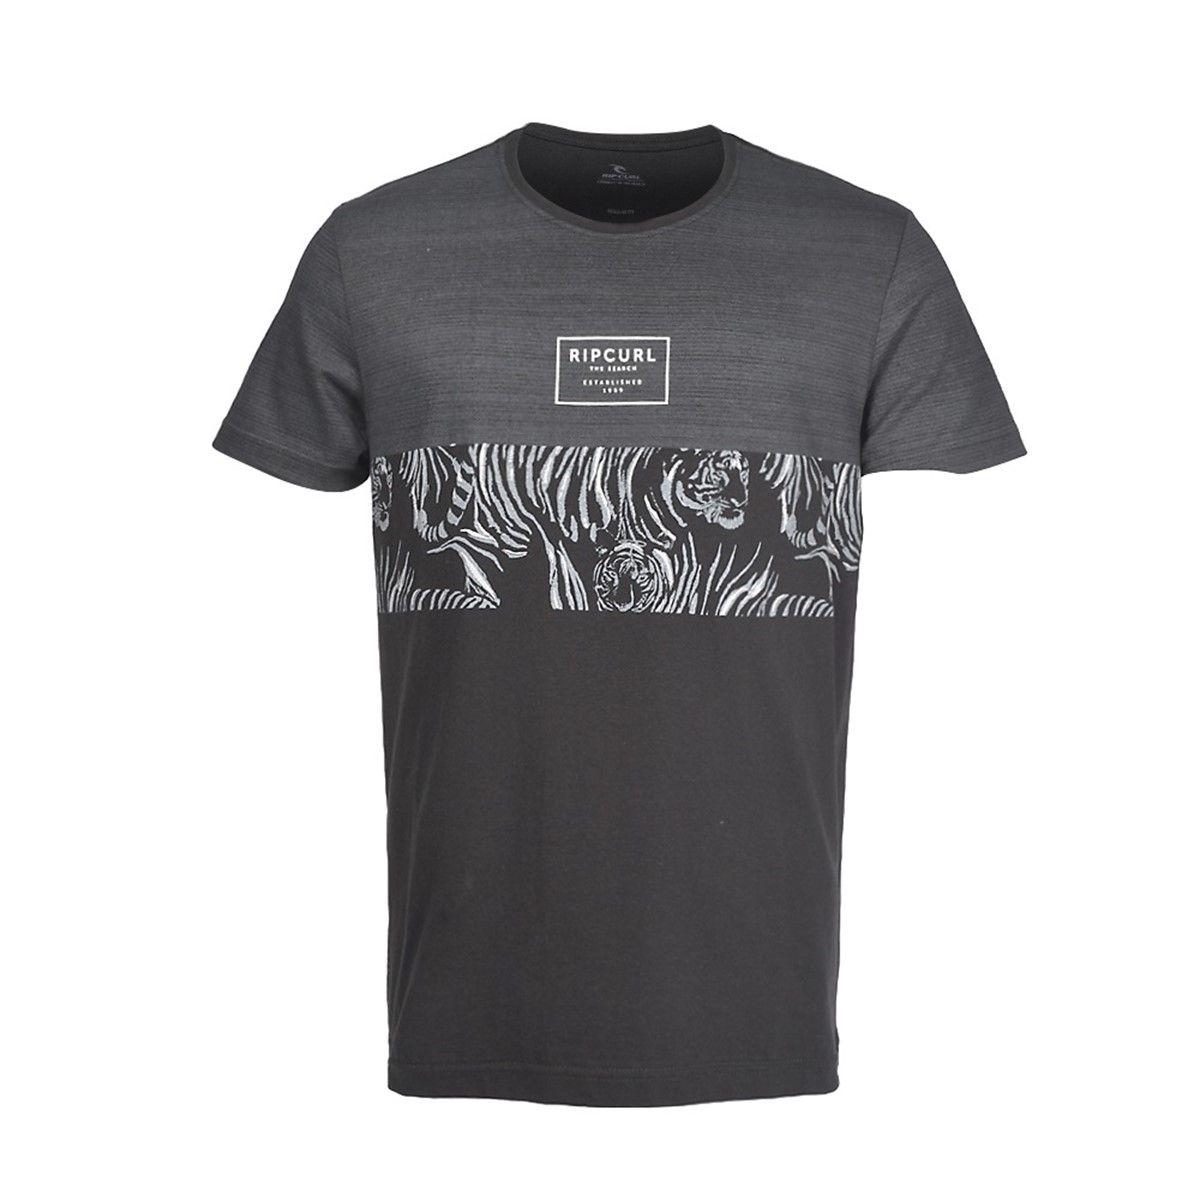 Camiseta Rip Curl Gabriel Medina Flower Cut Black